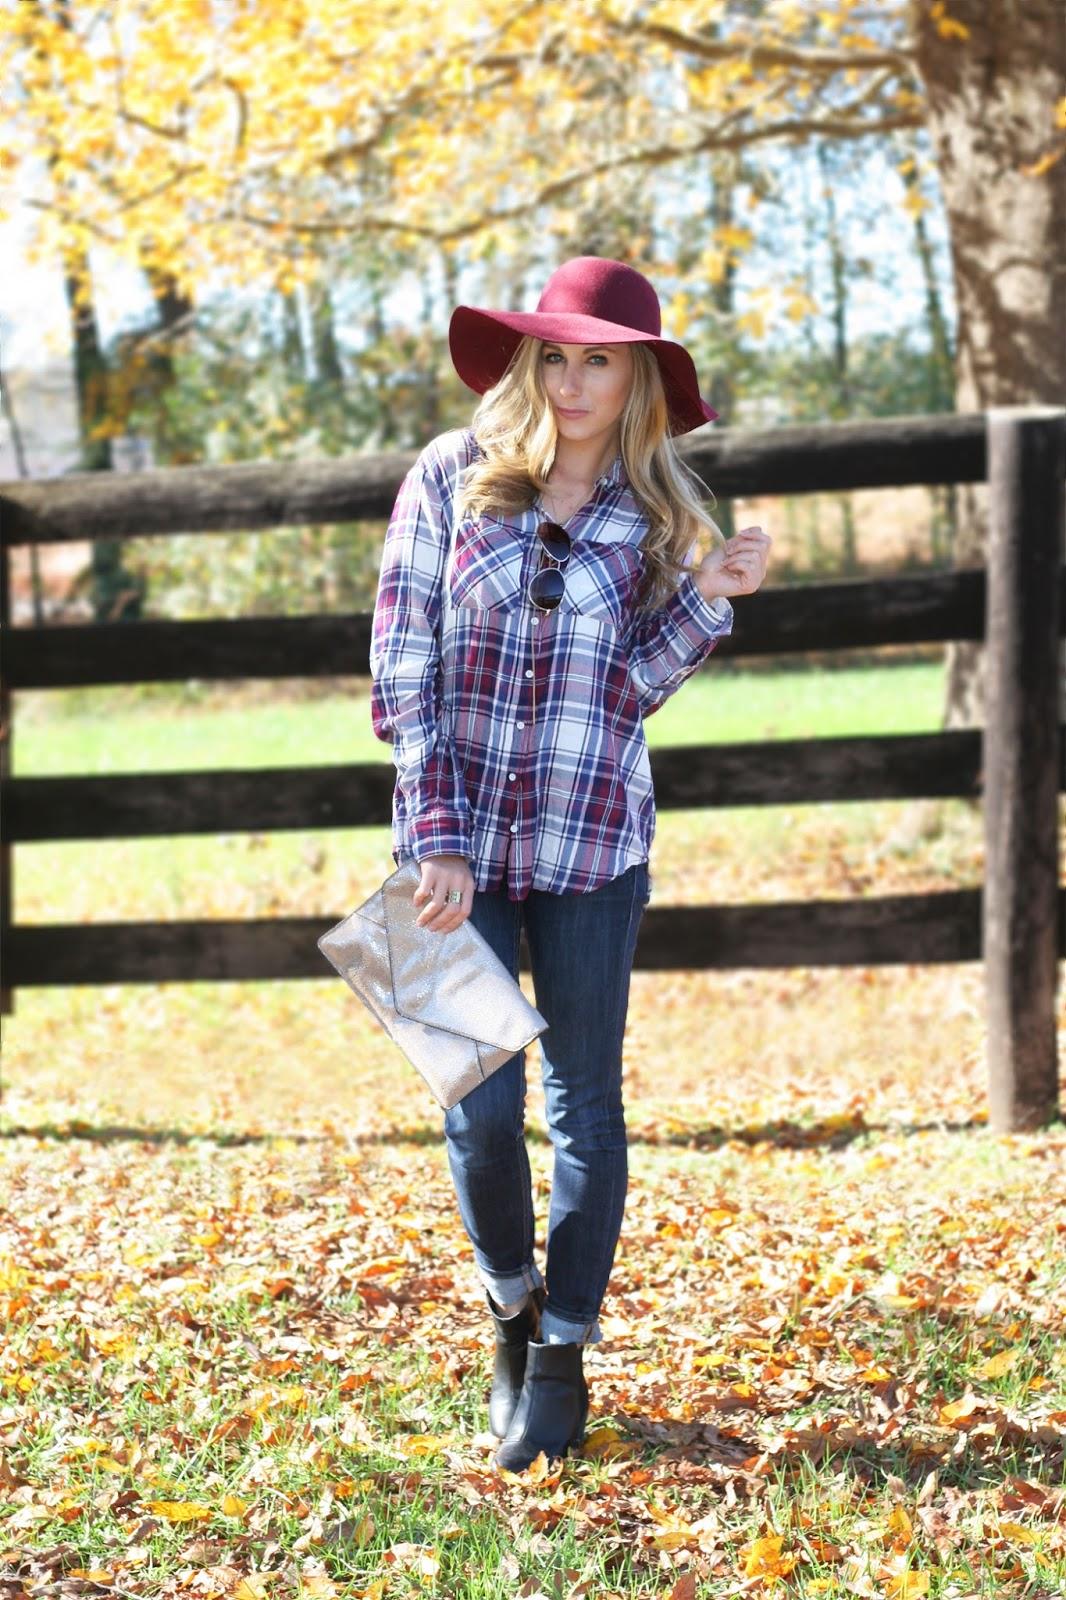 burgundy-floppy-felt-hat-with-plaid-button-up-shirt